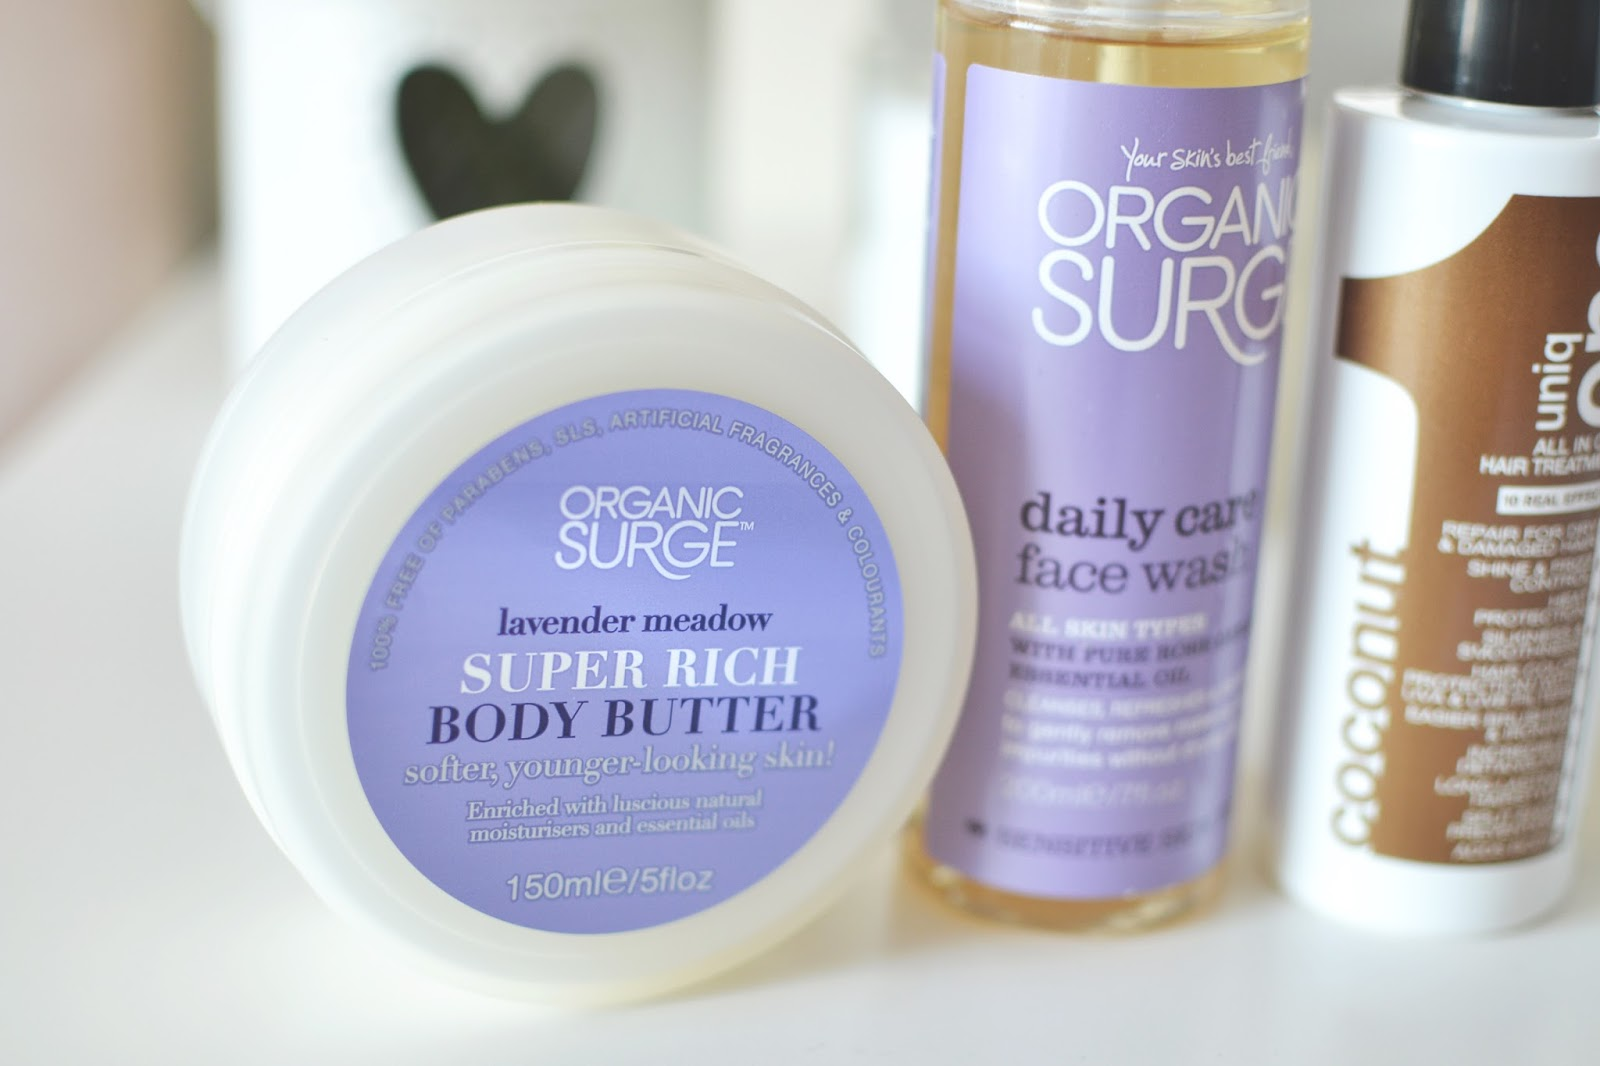 organic surge body butter, lavender body butter